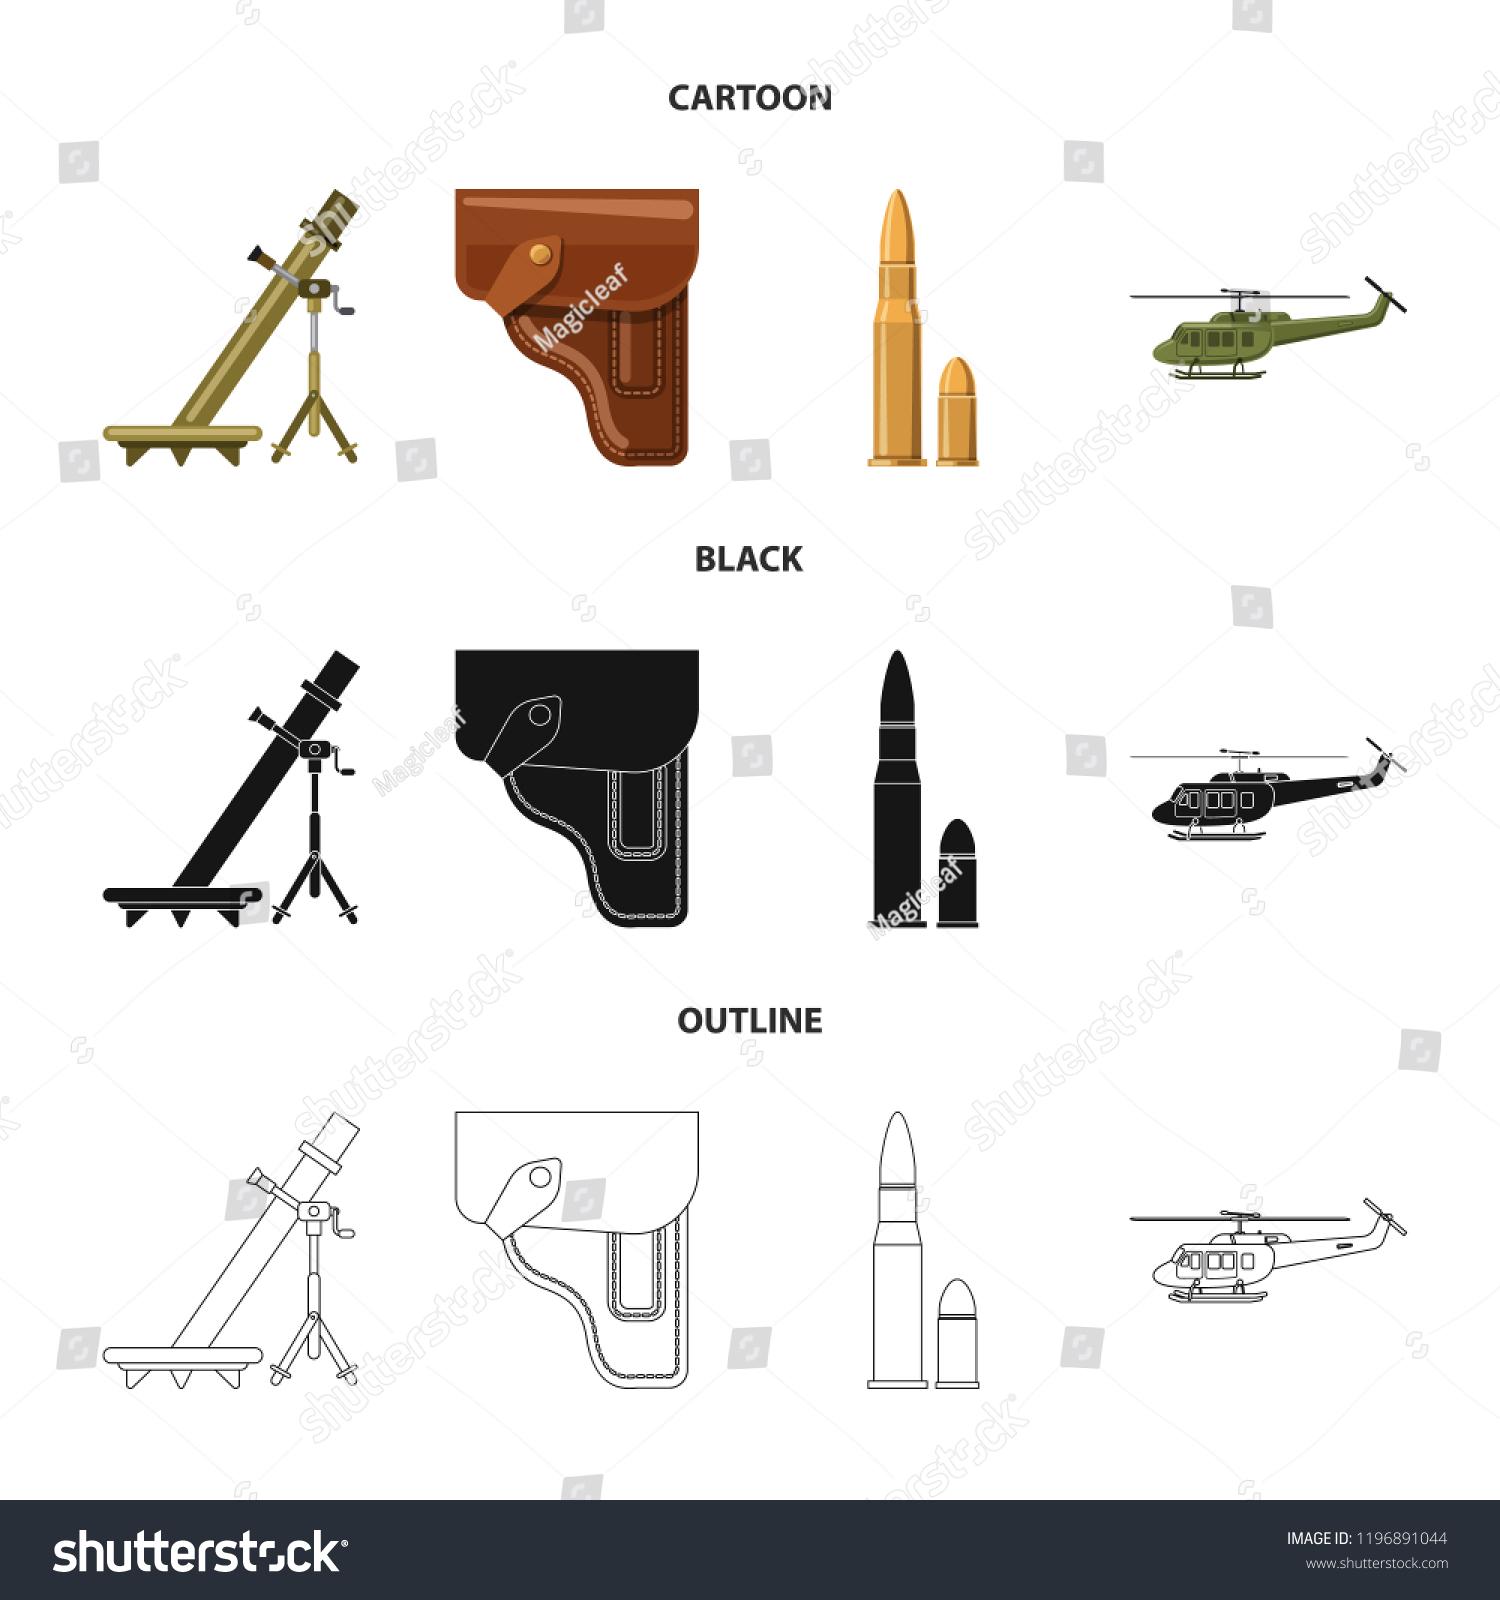 Magic Gun Diagram Automotive Wiring Black Fan Vector Illustration Weapon Symbol Set Stock Royalty Free Rh Shutterstock Com Glyphs Pronunciation Power